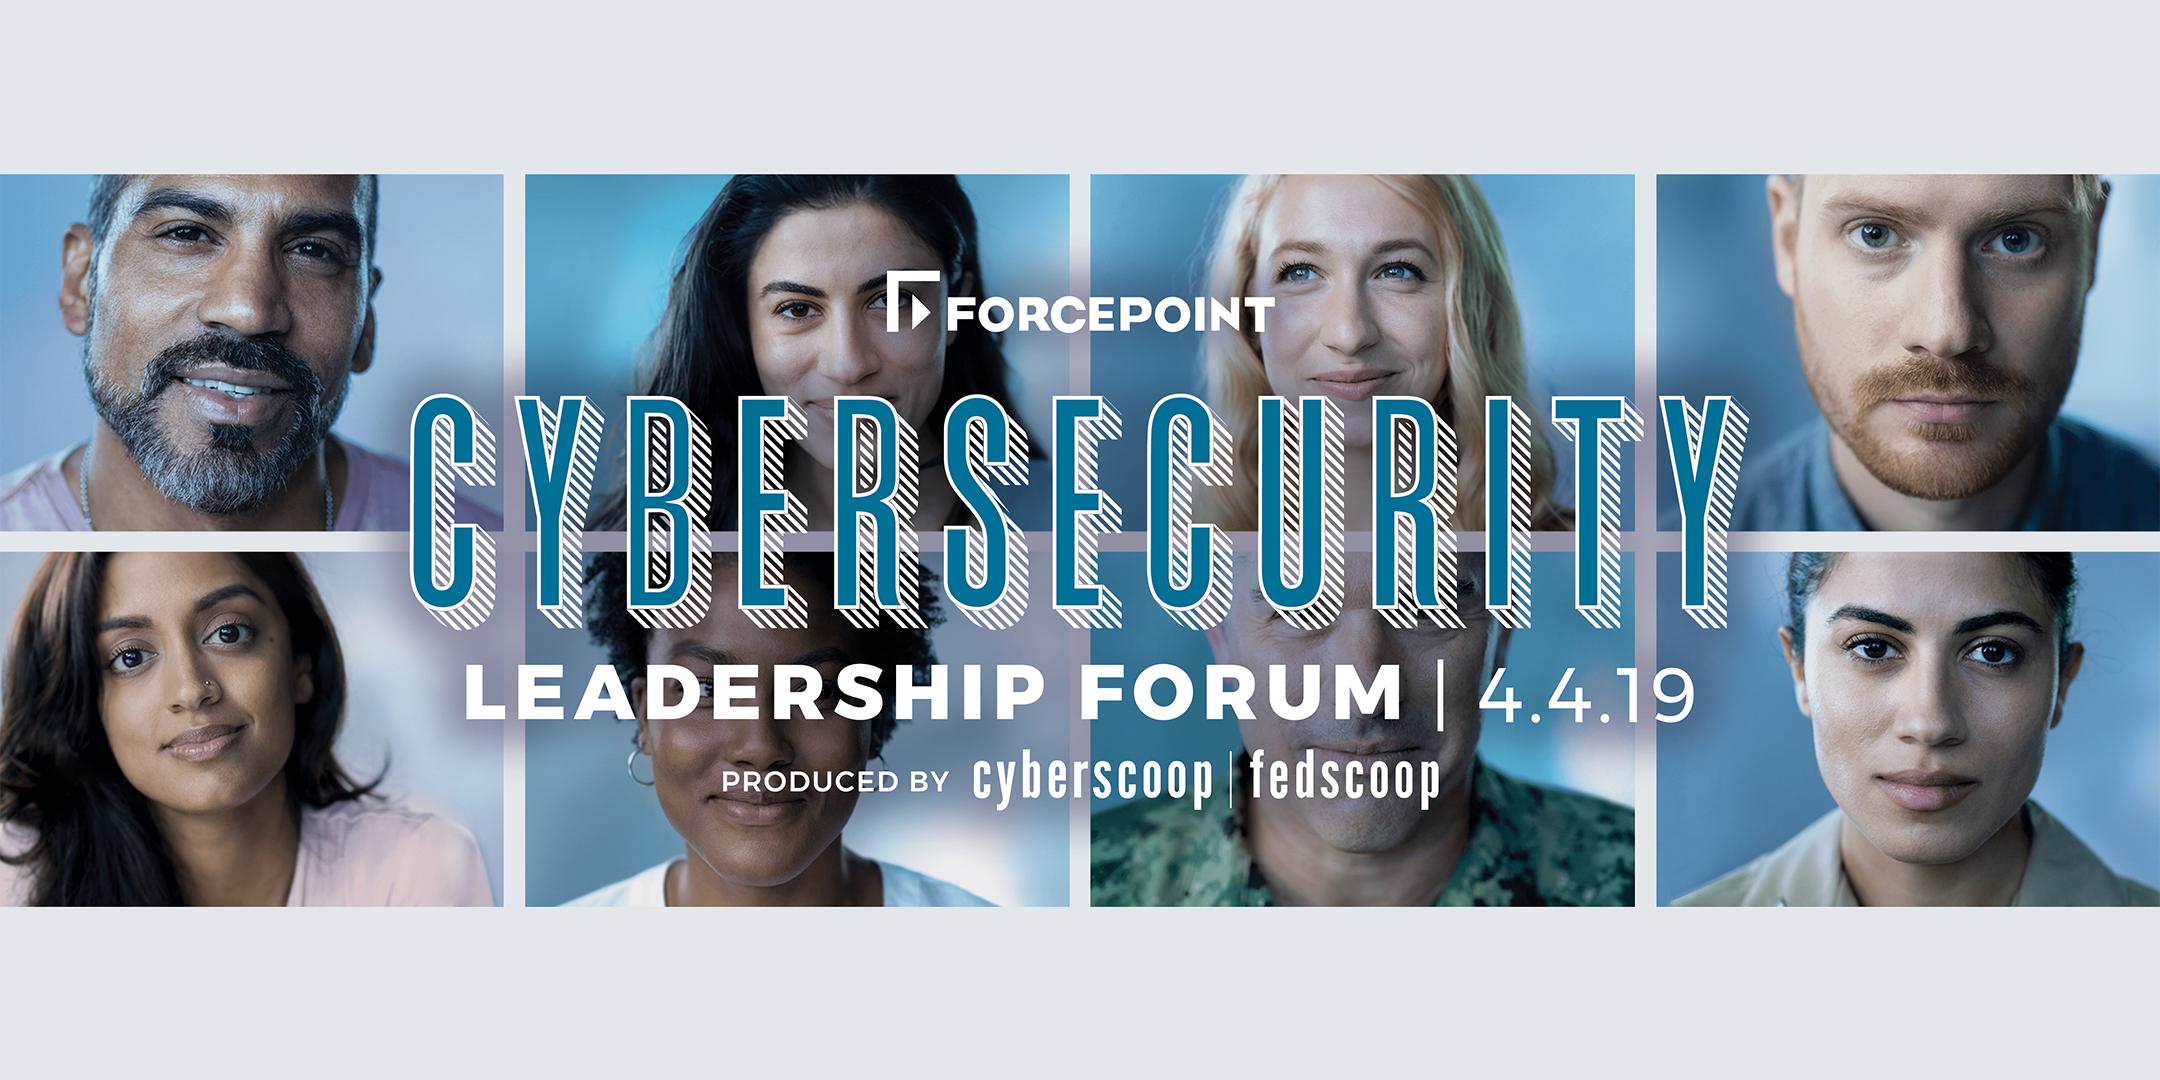 Cybersecurity Leadership Forum